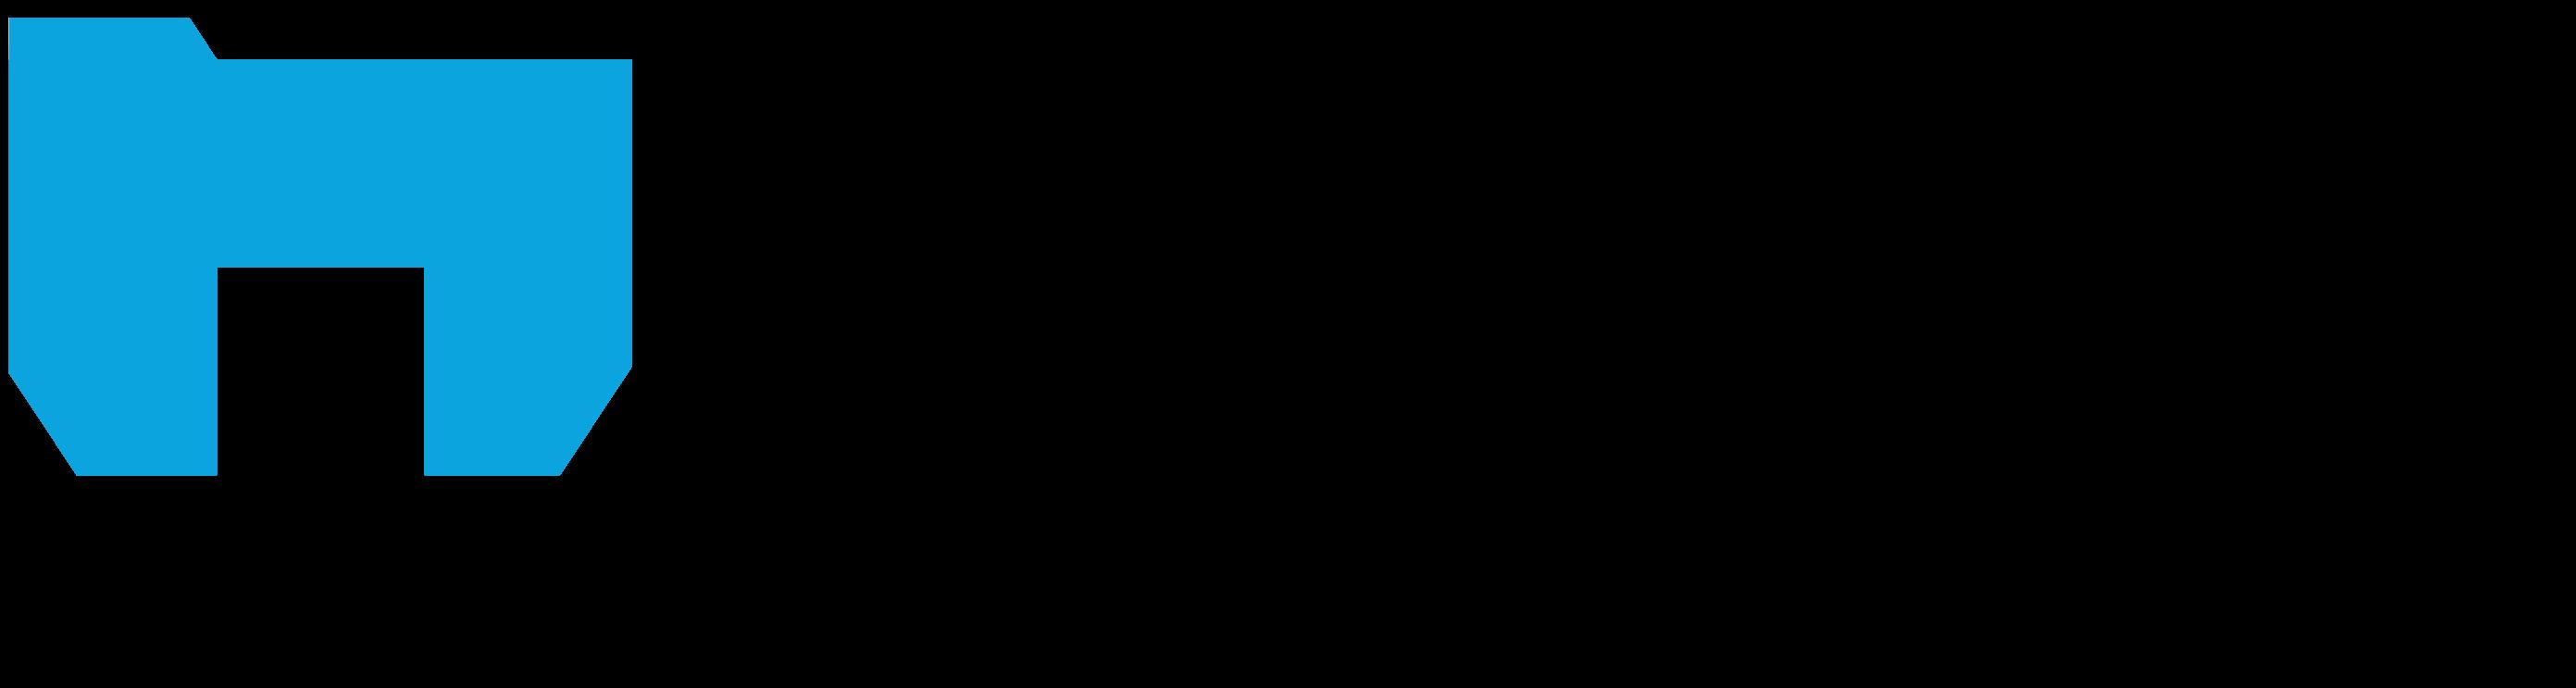 nojp.net Logo